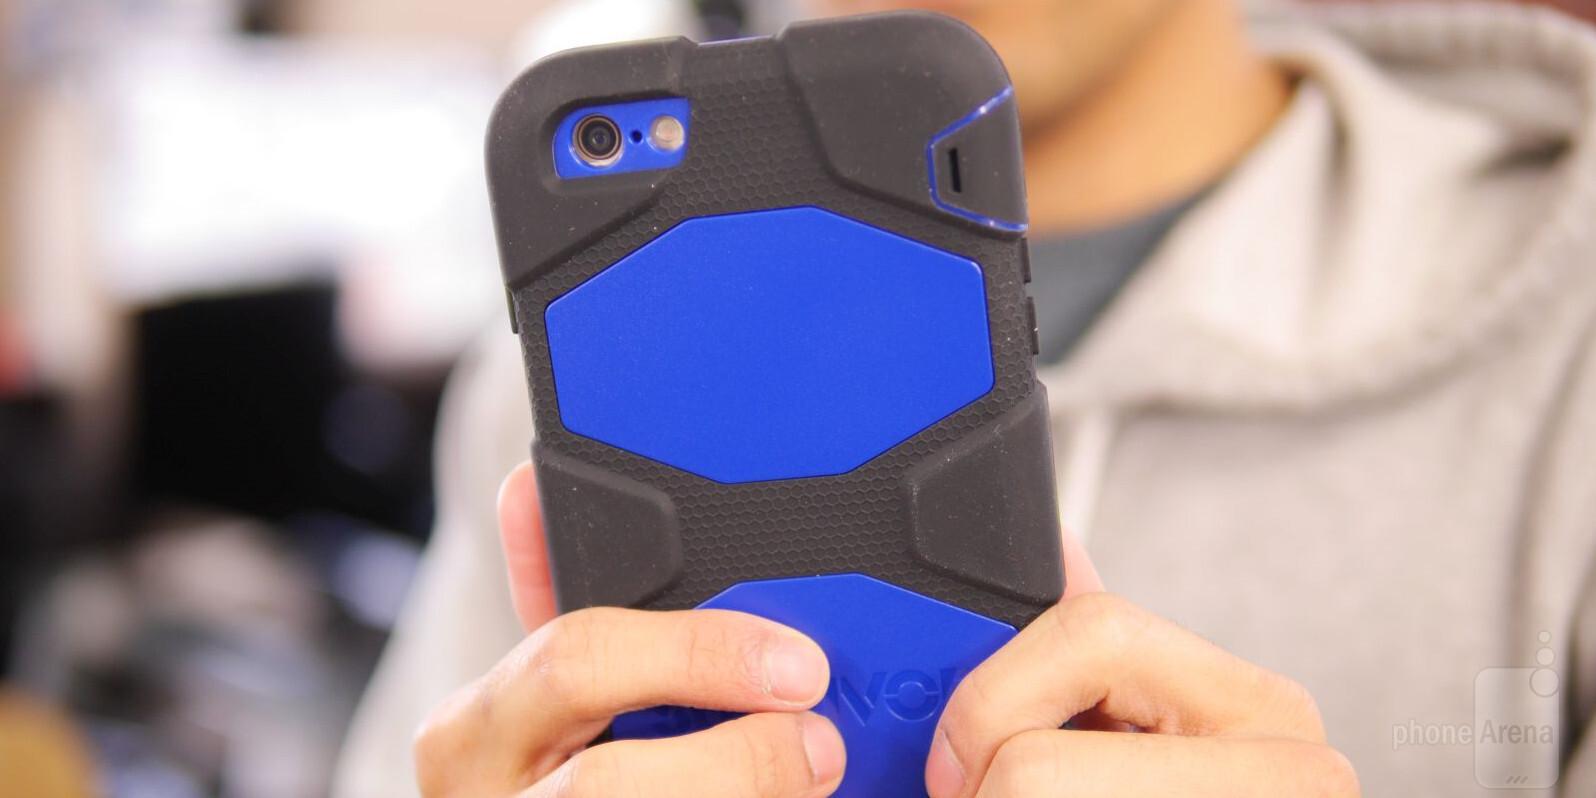 73293776ced Griffin Survivor All-Terrain Case for Apple iPhone 6 Plus Review ...